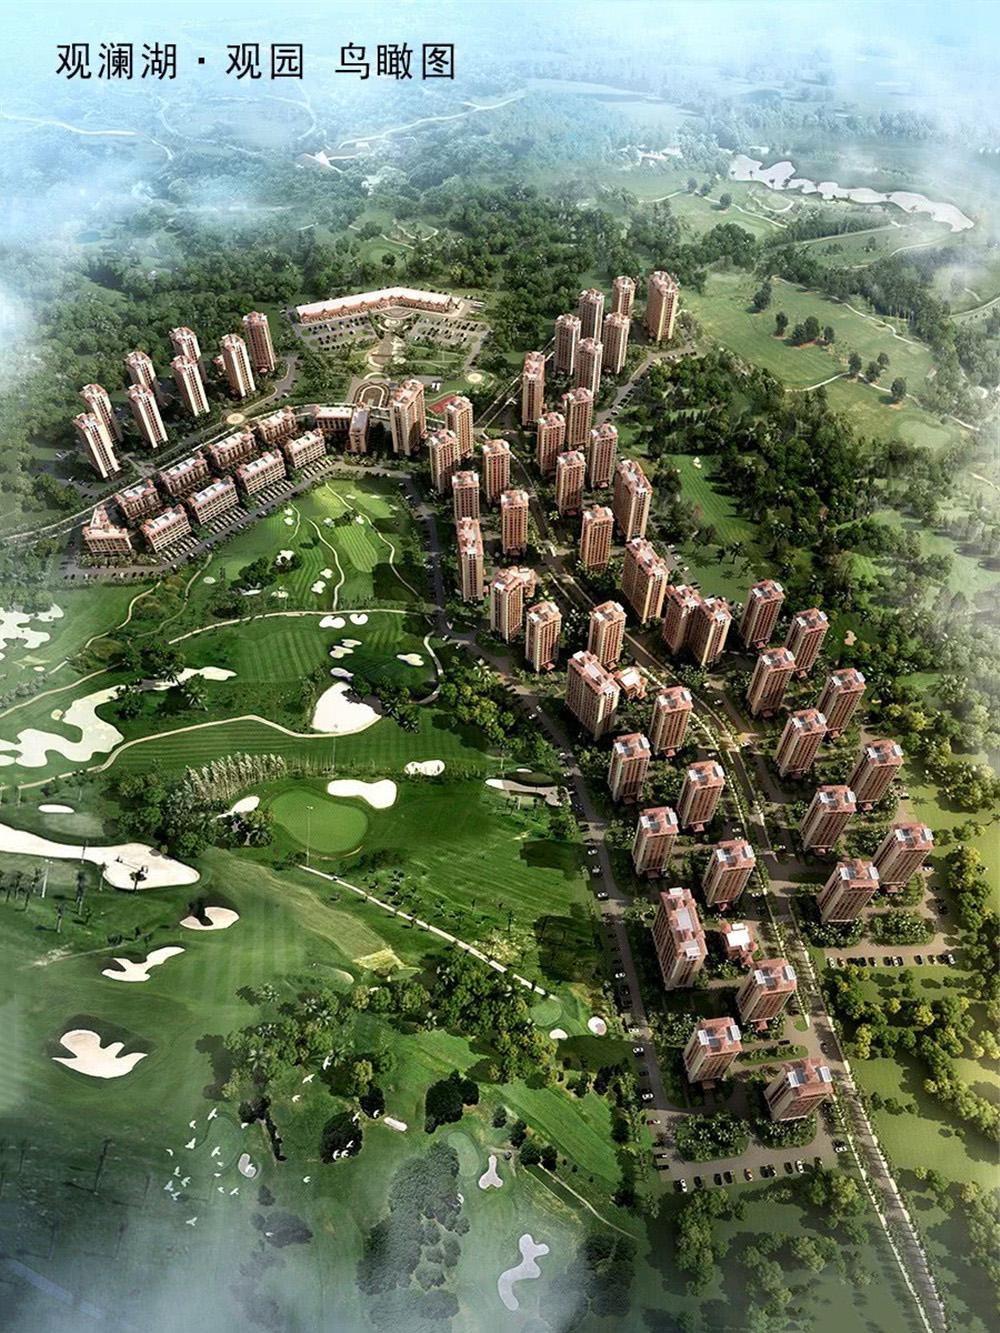 http://yuefangwangimg.oss-cn-hangzhou.aliyuncs.com/uploads/20200316/f39273630952a837f9fd9d4f1b078ef0Max.jpg